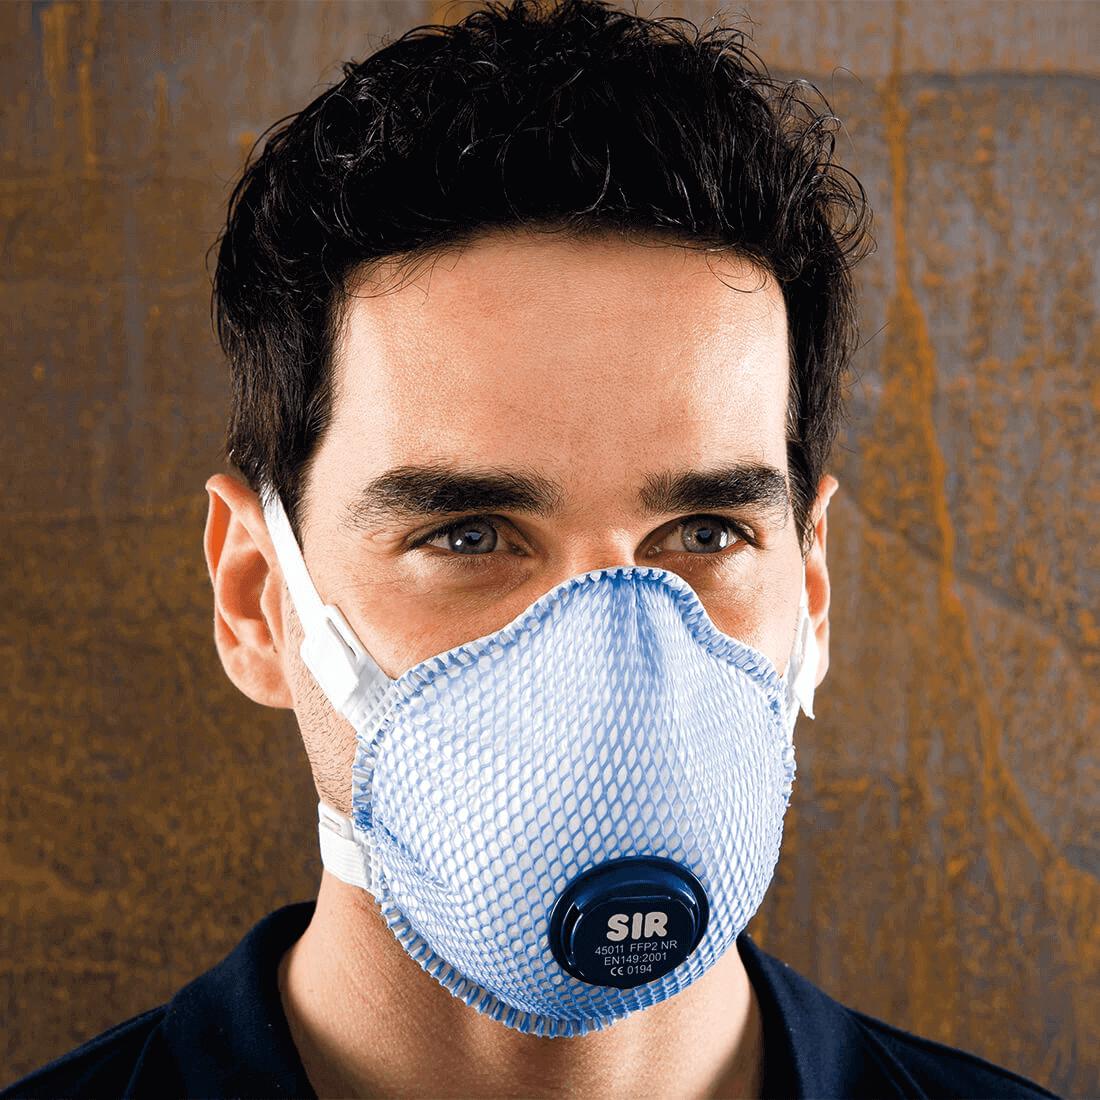 Respiratore monouso alta efficacia